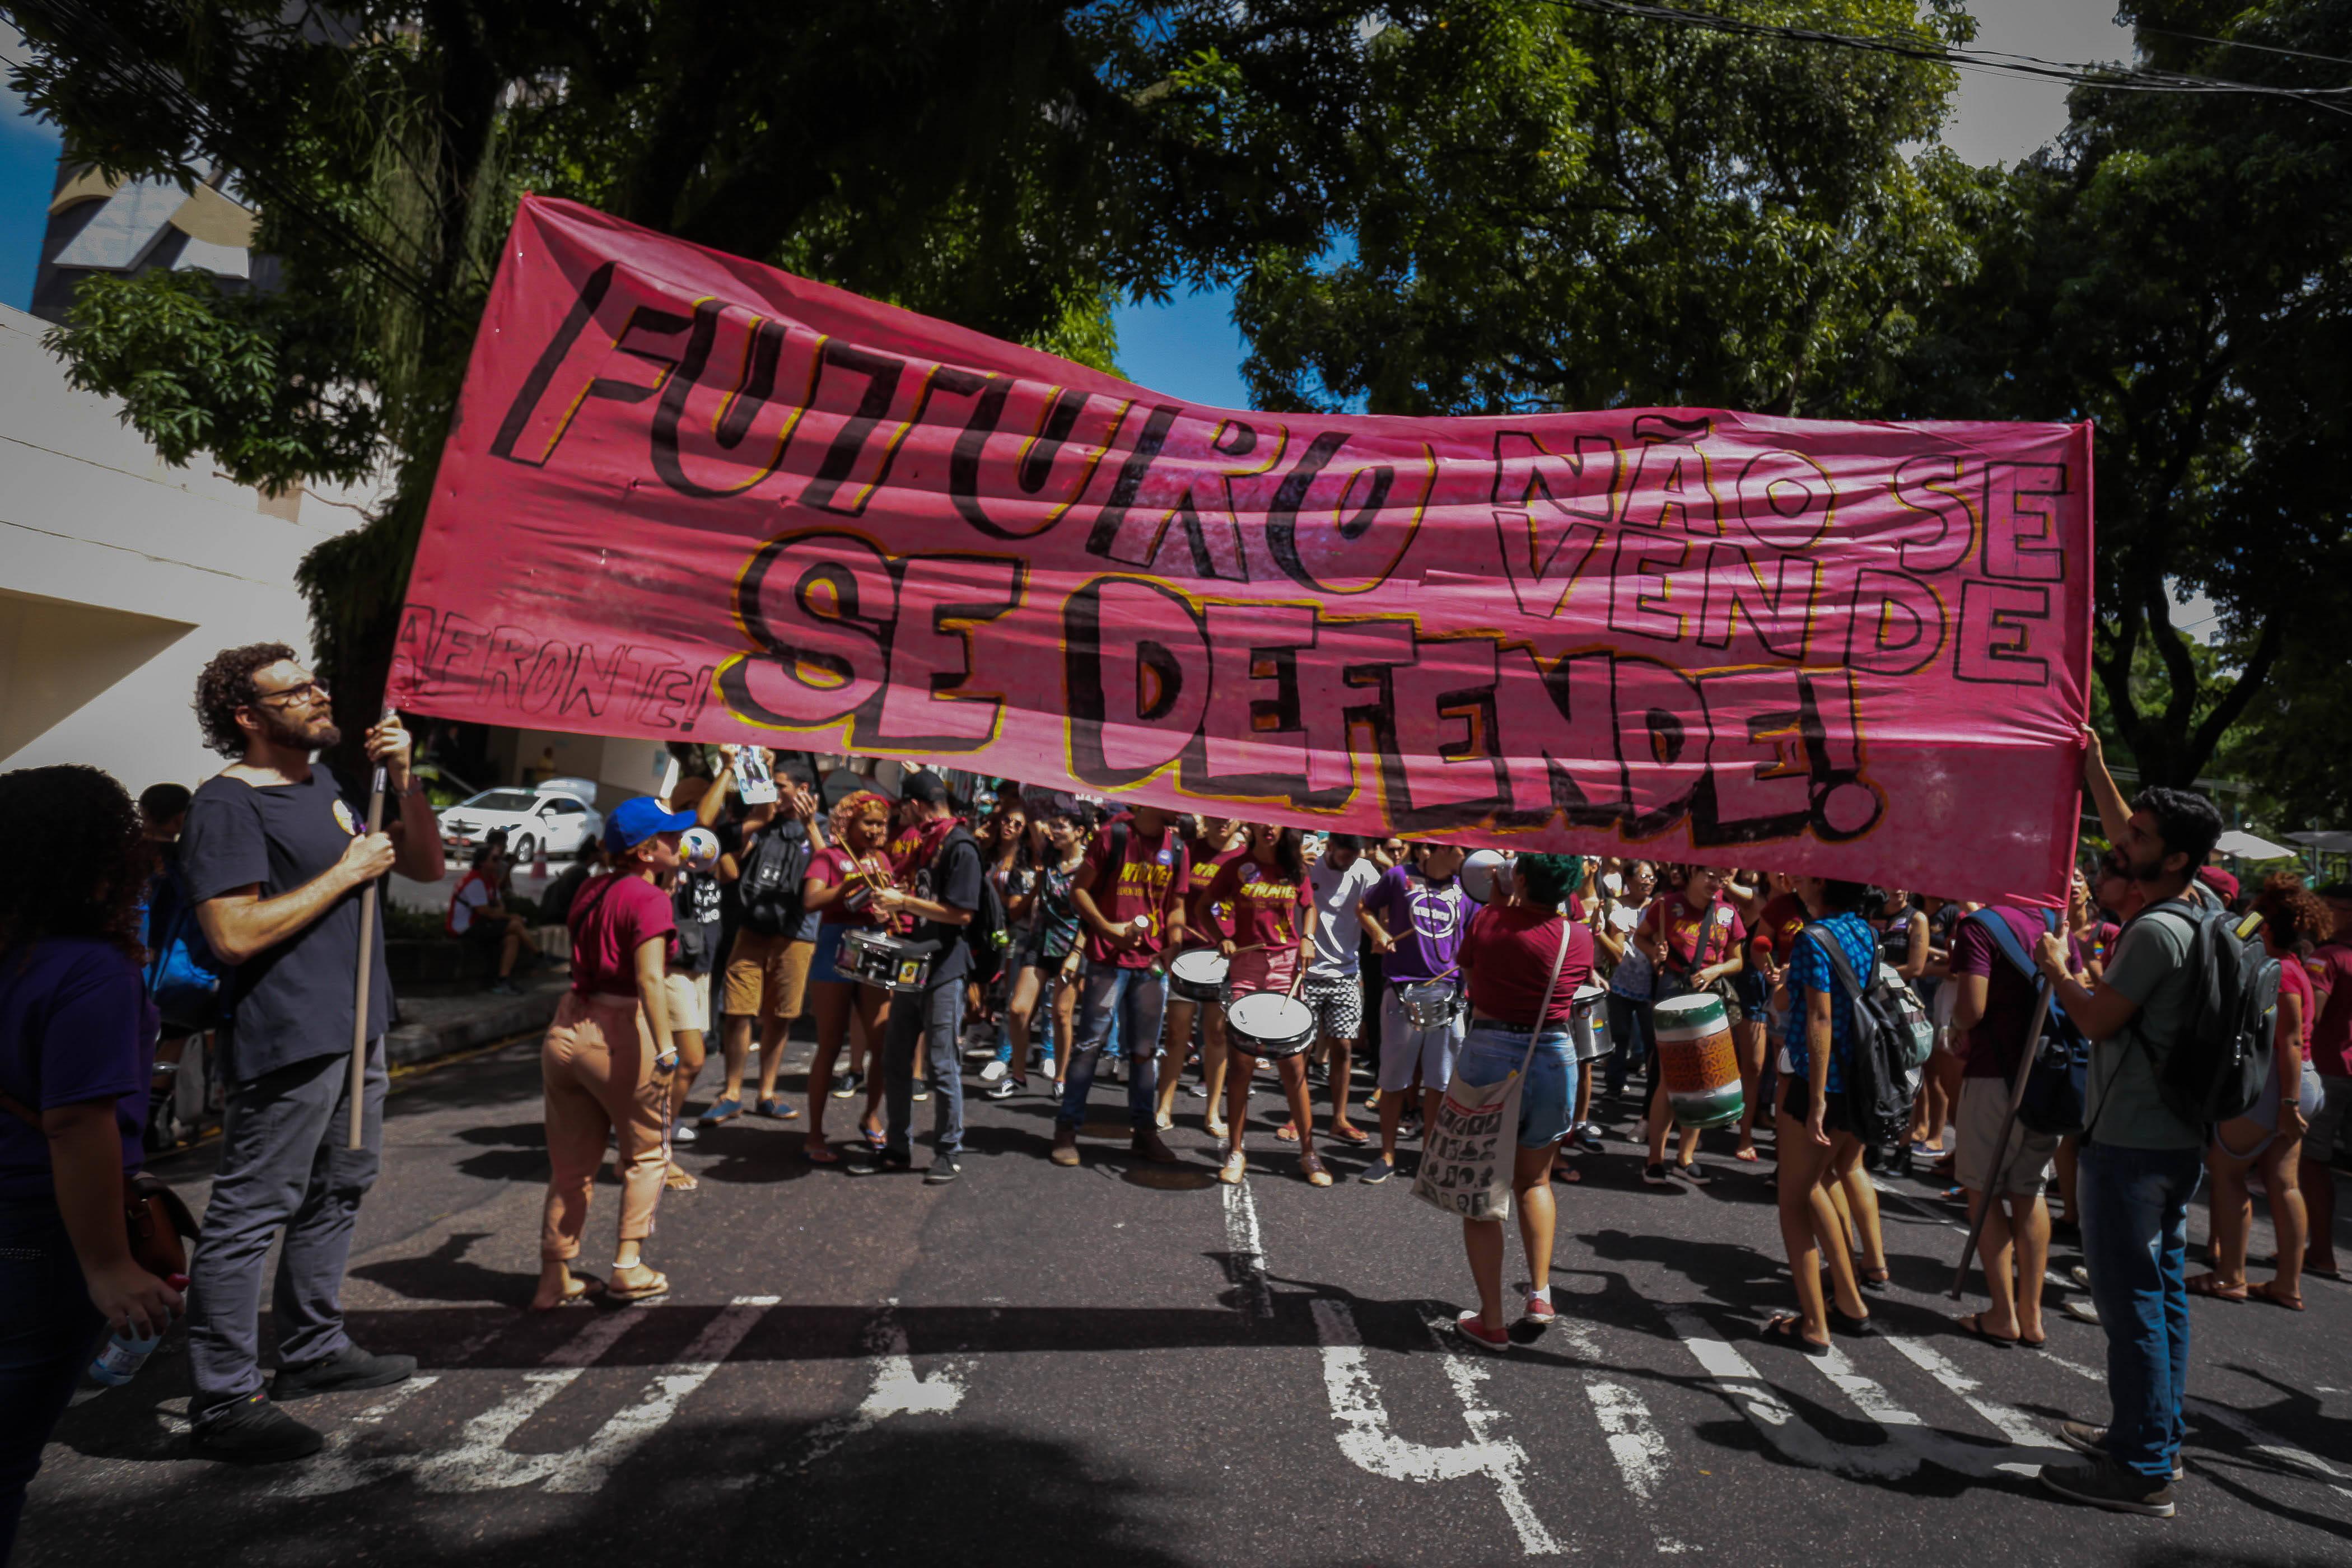 Manifestantes em Belém (PA). Foto: Filipe Bispo/Fotoarena/Agência O Globo